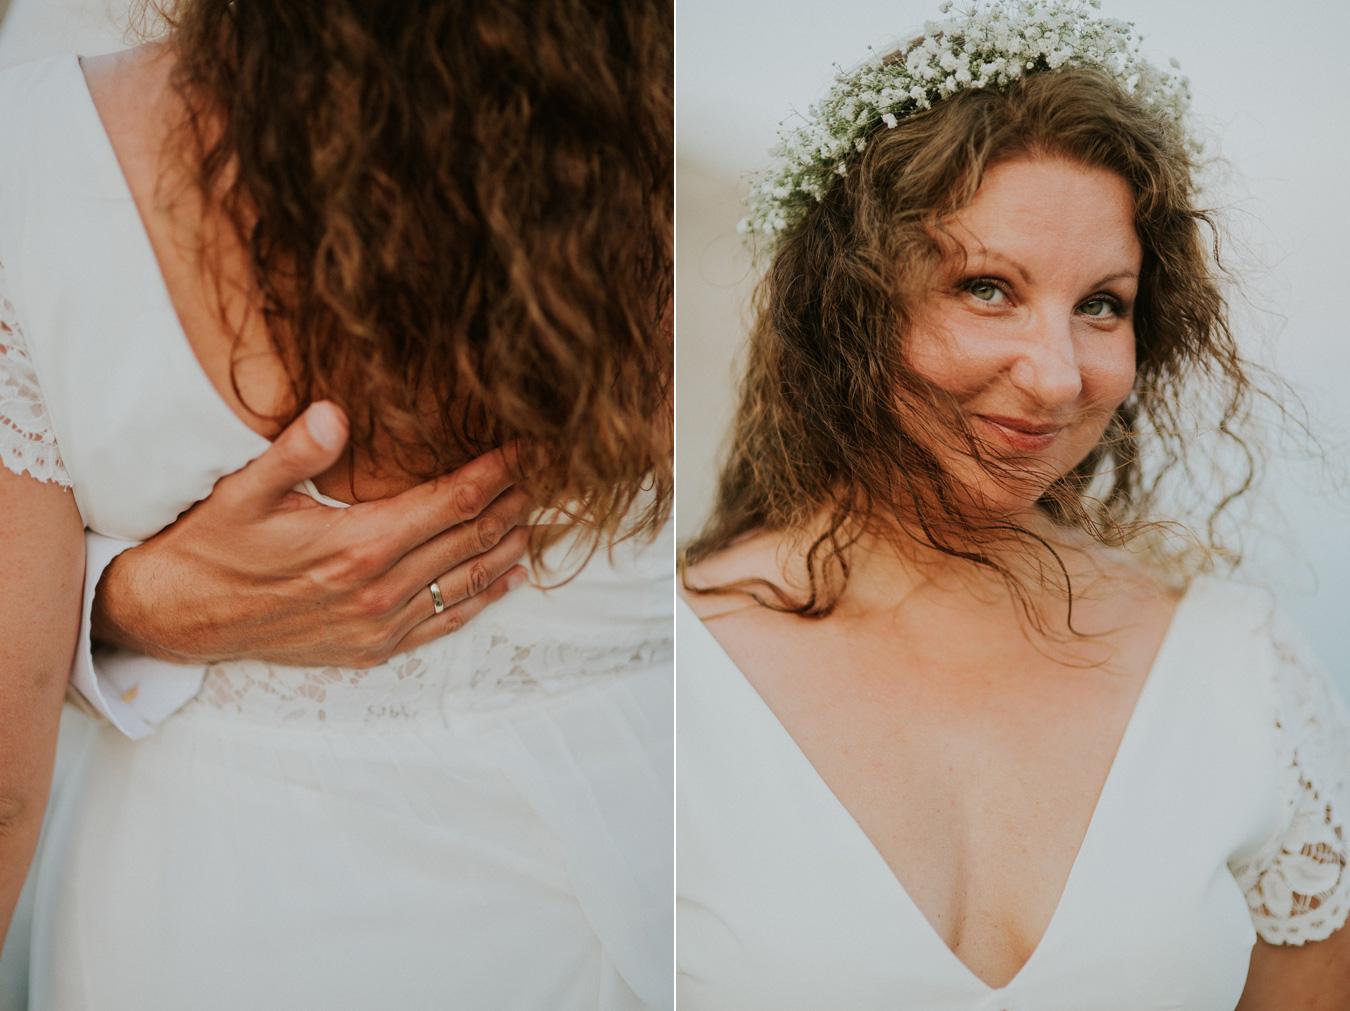 072-bryllupsfotograf-oslo-destinasjonsbryllup-fotograf-tone-tvedt.jpg